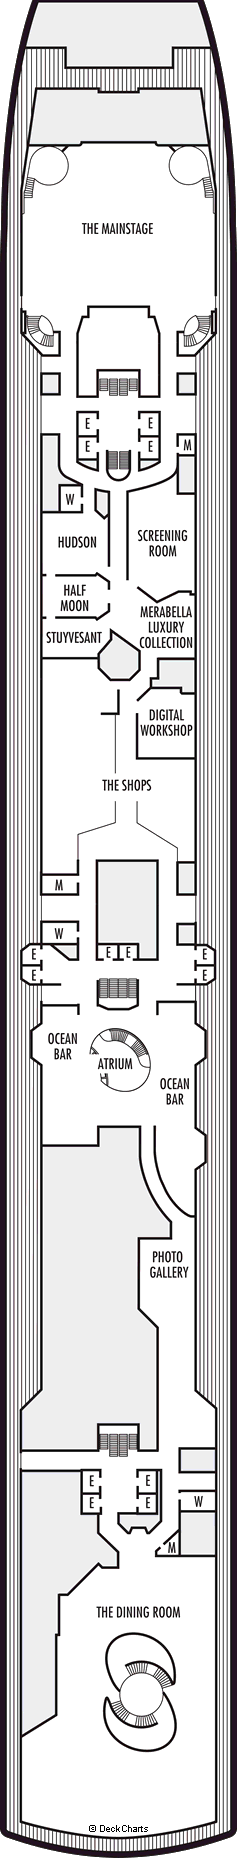 Oosterdam: Promenade Deck